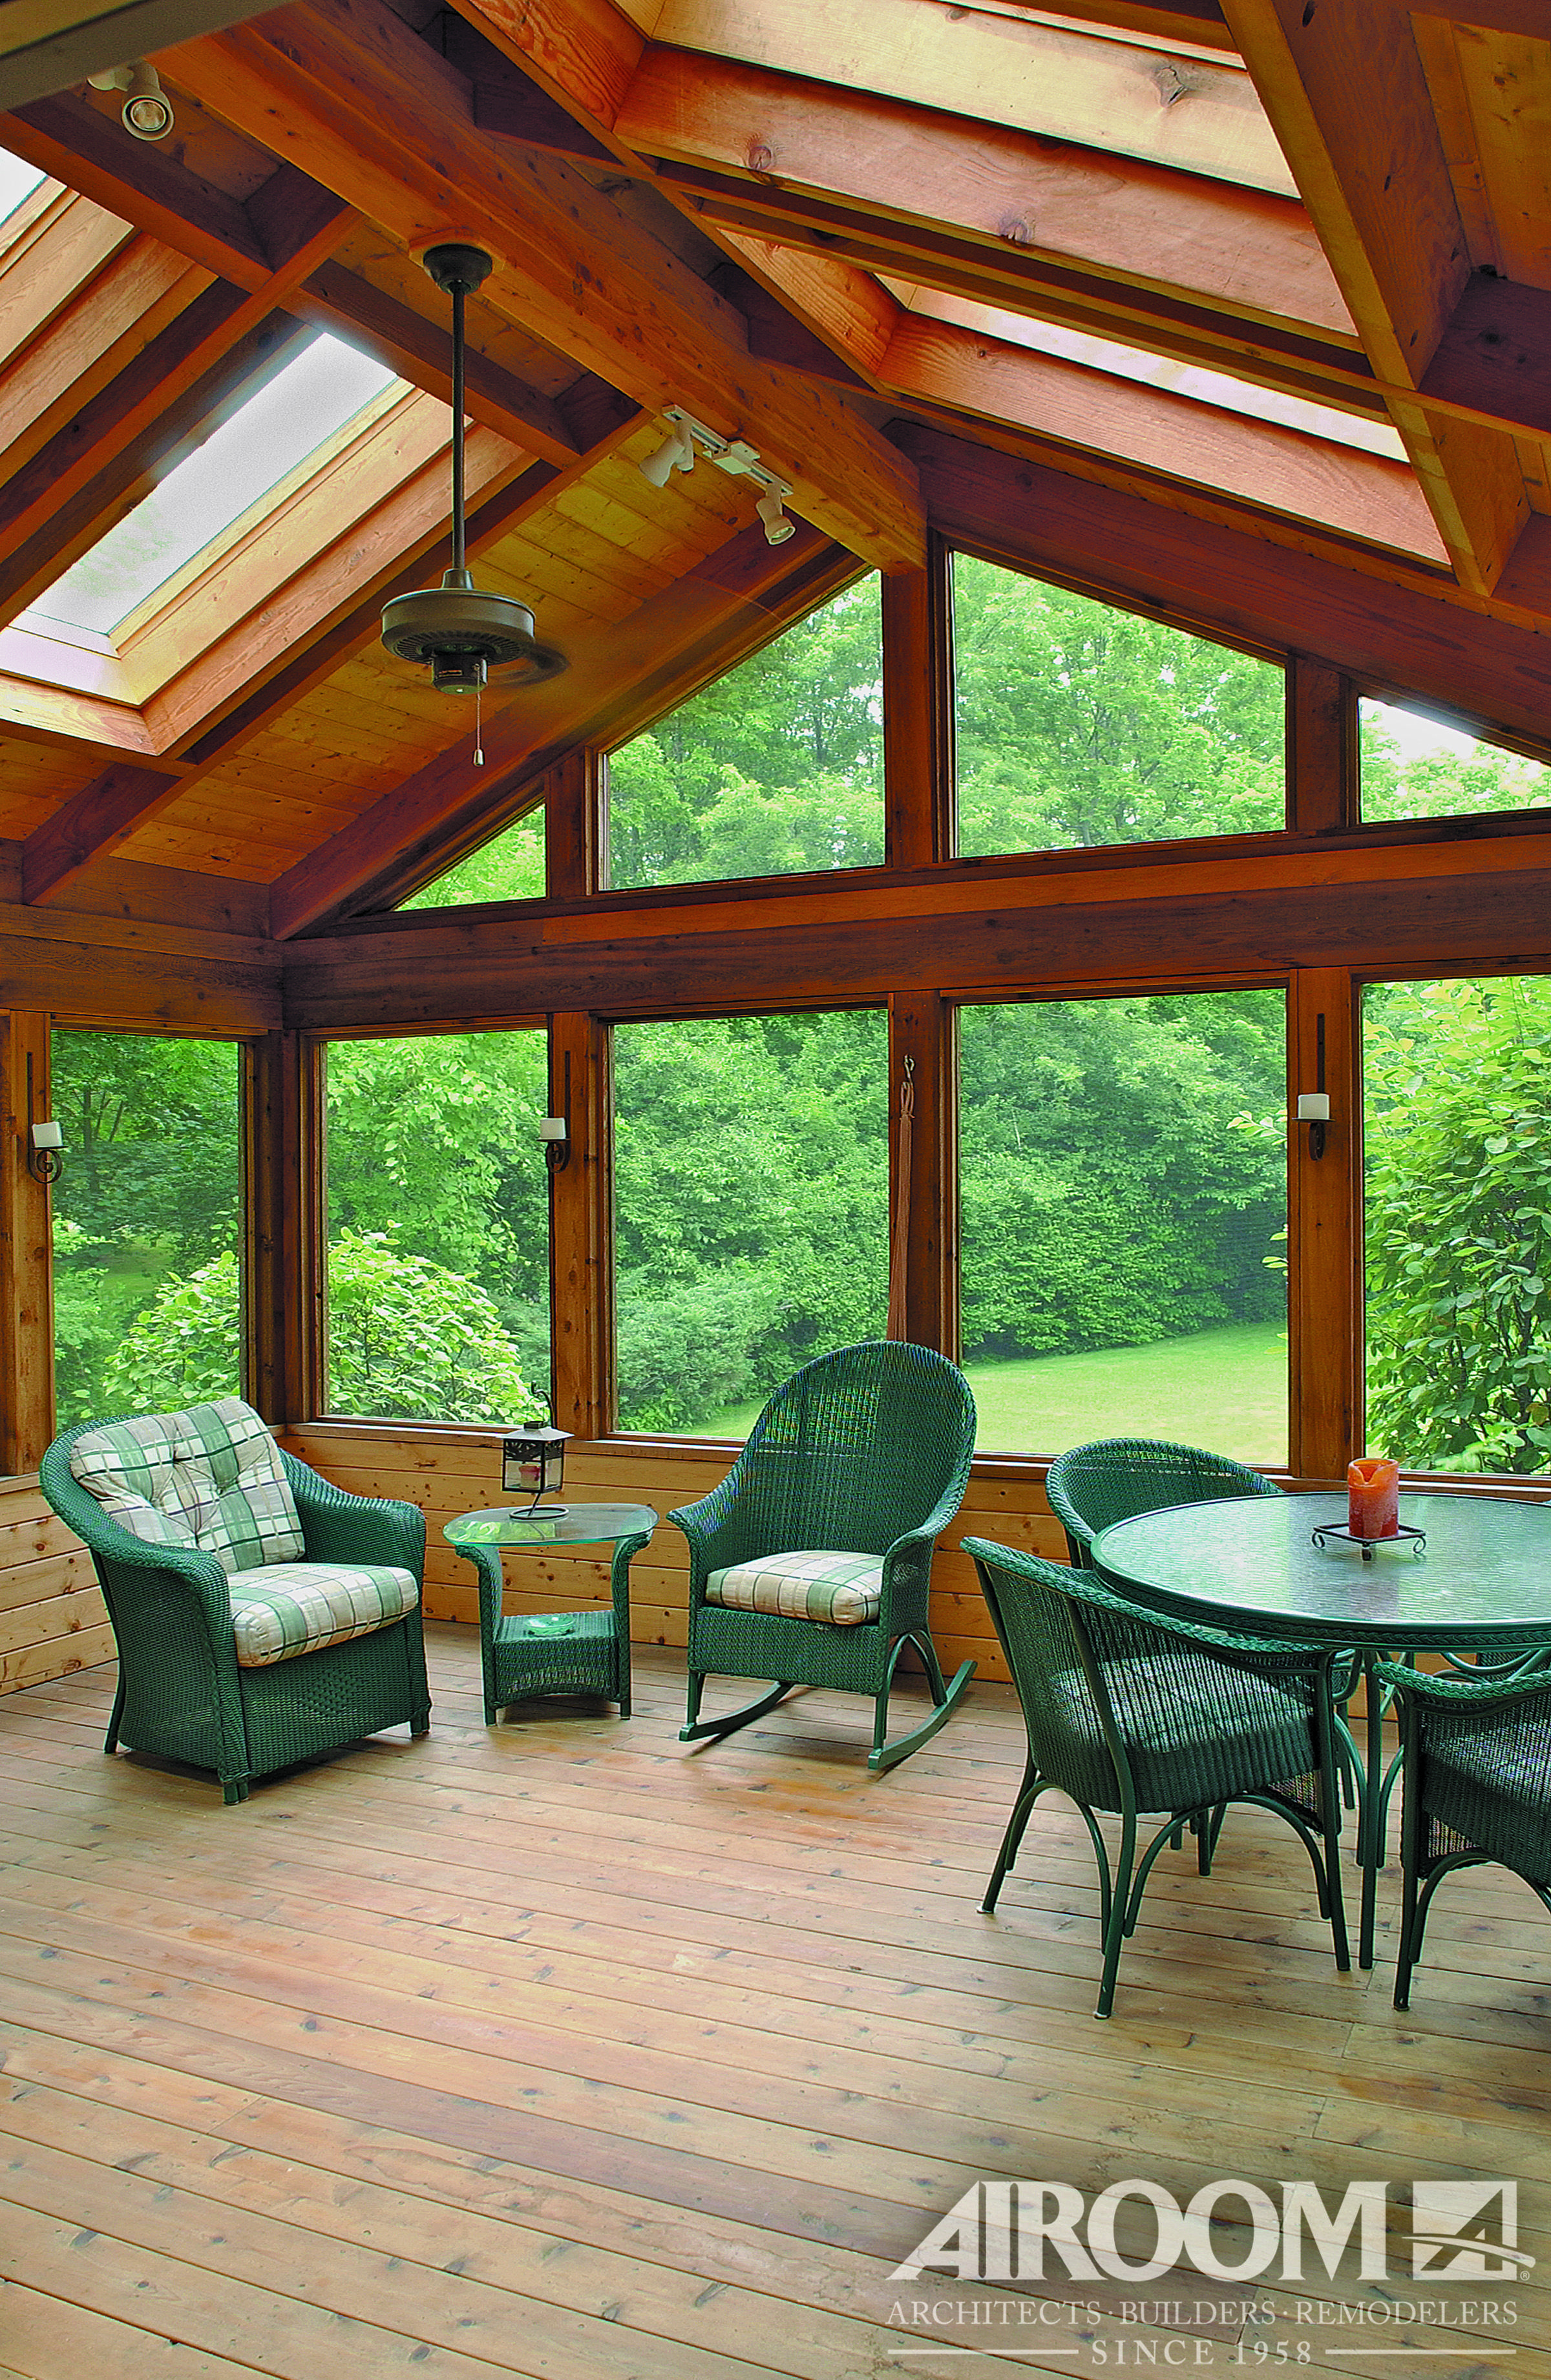 Home Additions Sunroom Decorating Four Seasons Room: Four Seasons Room, 4 Season Room, Porch Design